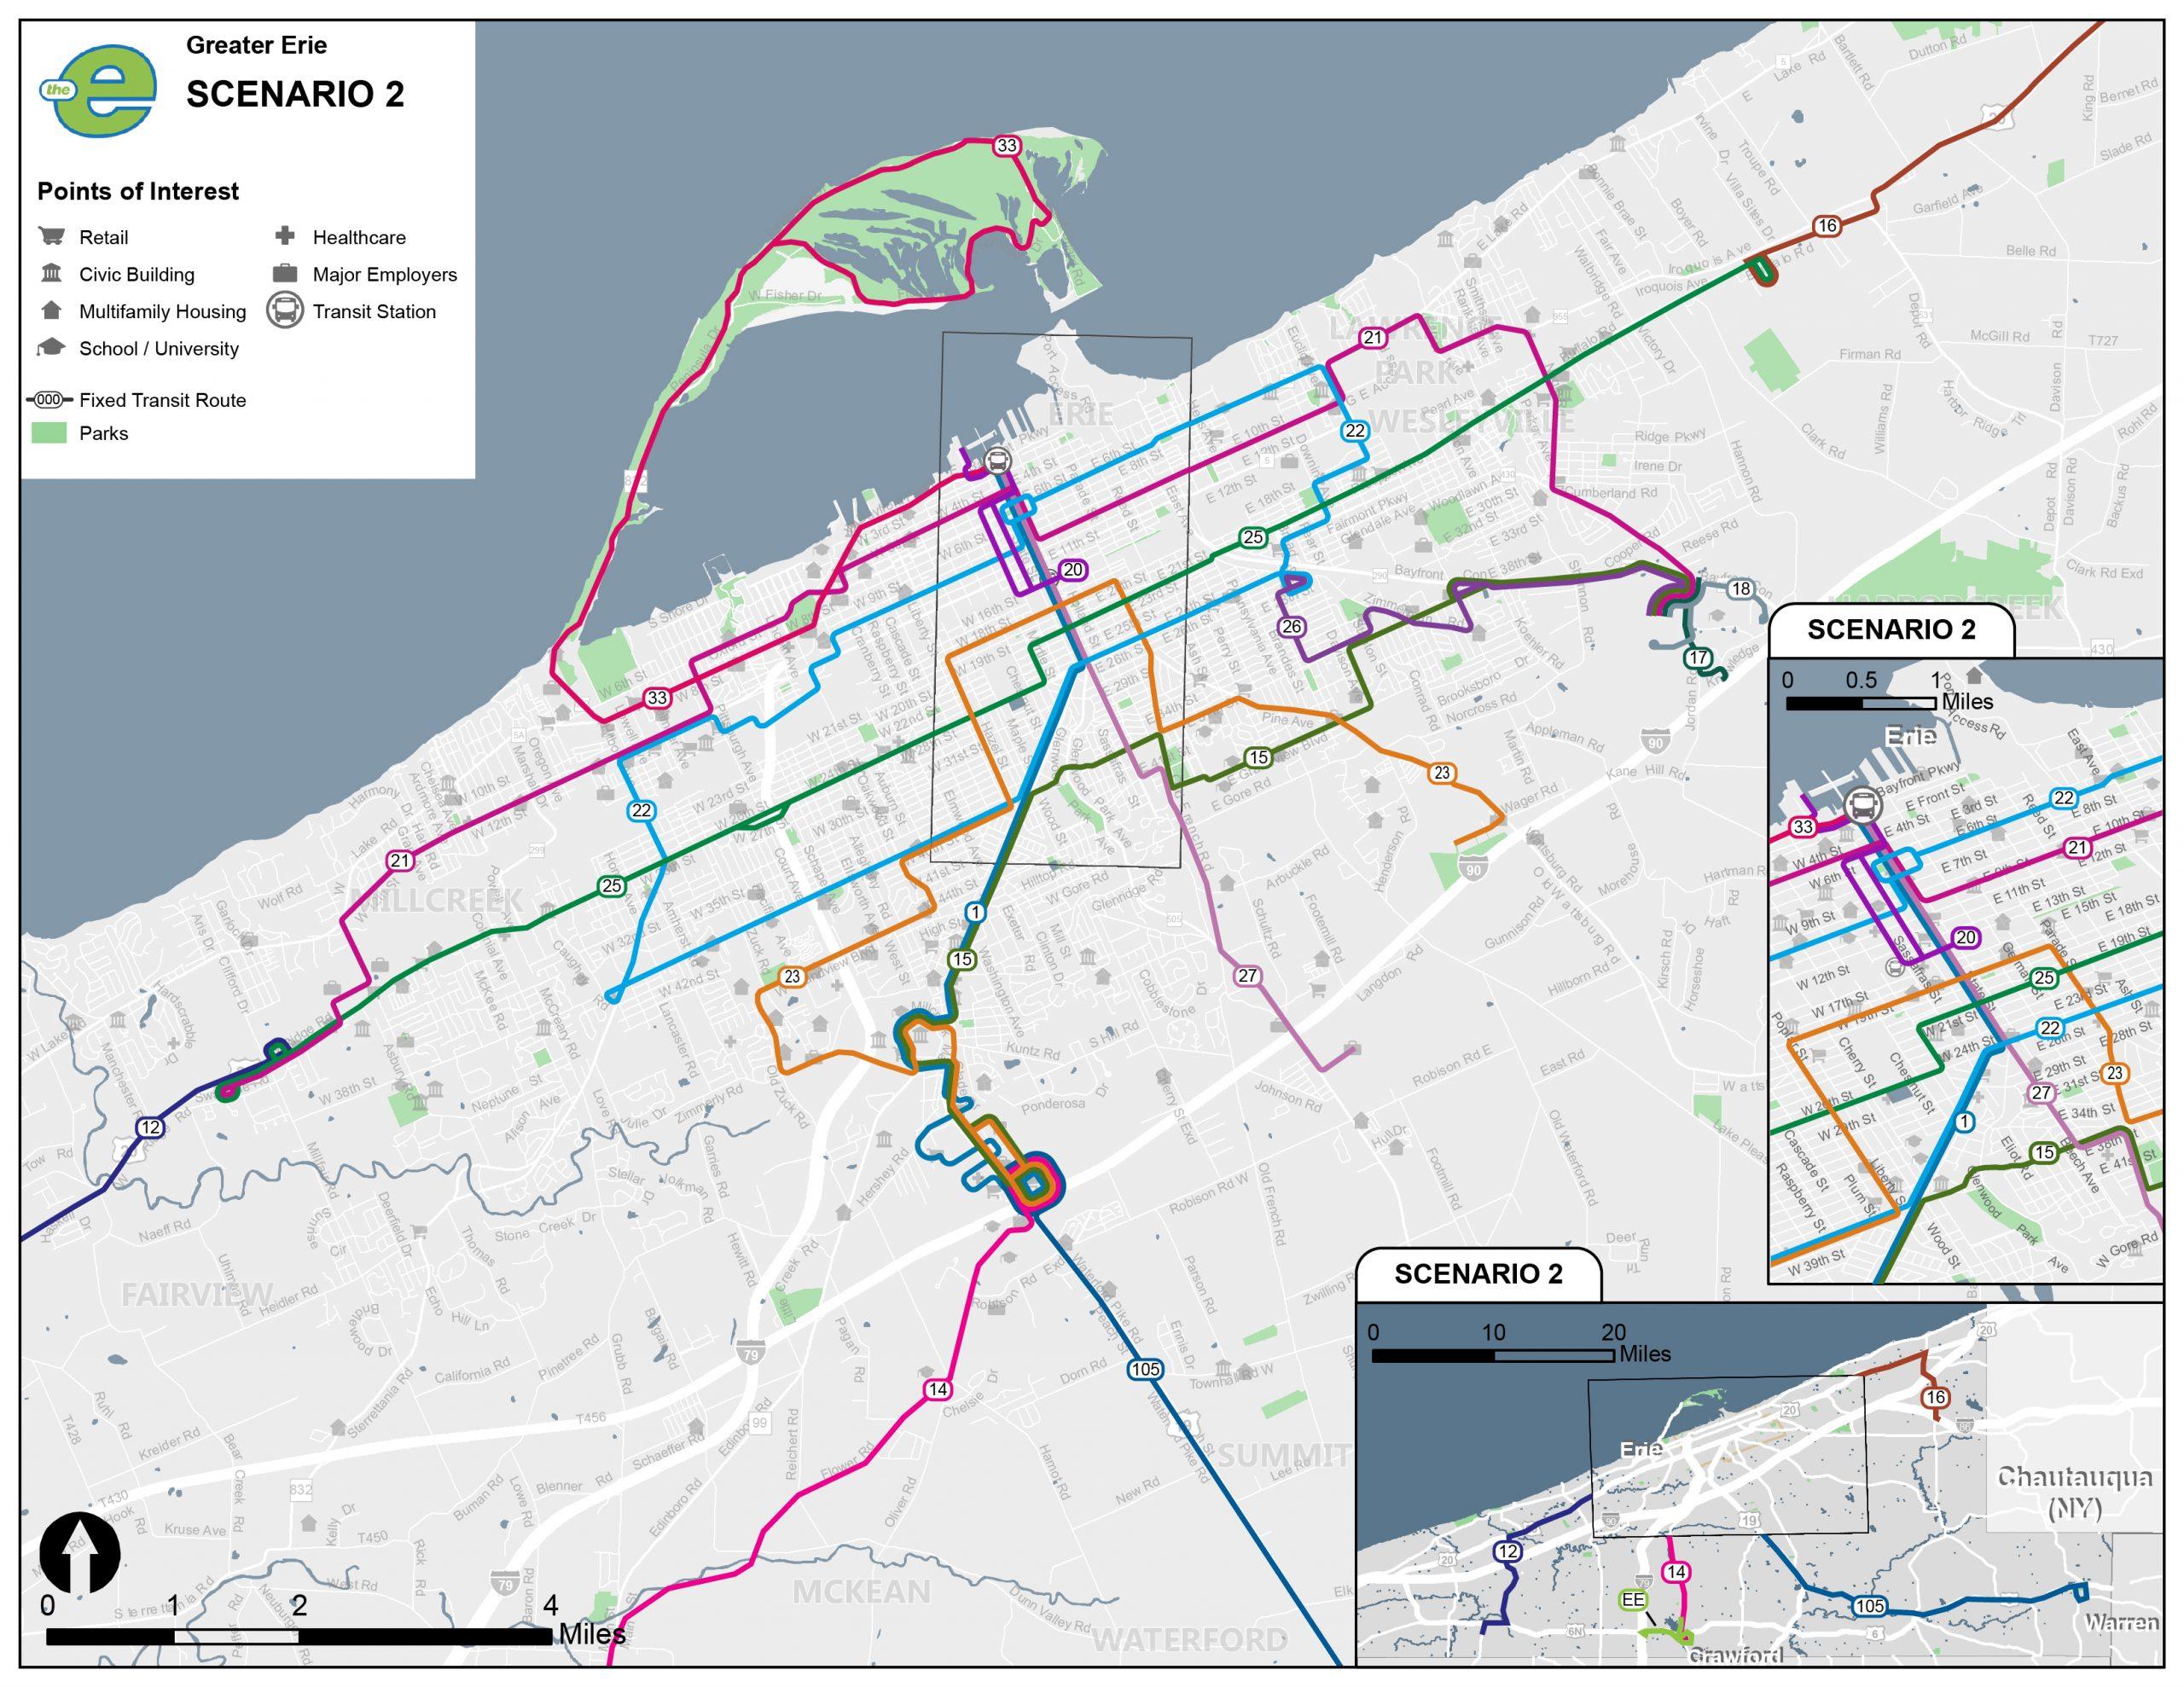 Scenario 2 of the EMTA bus route.